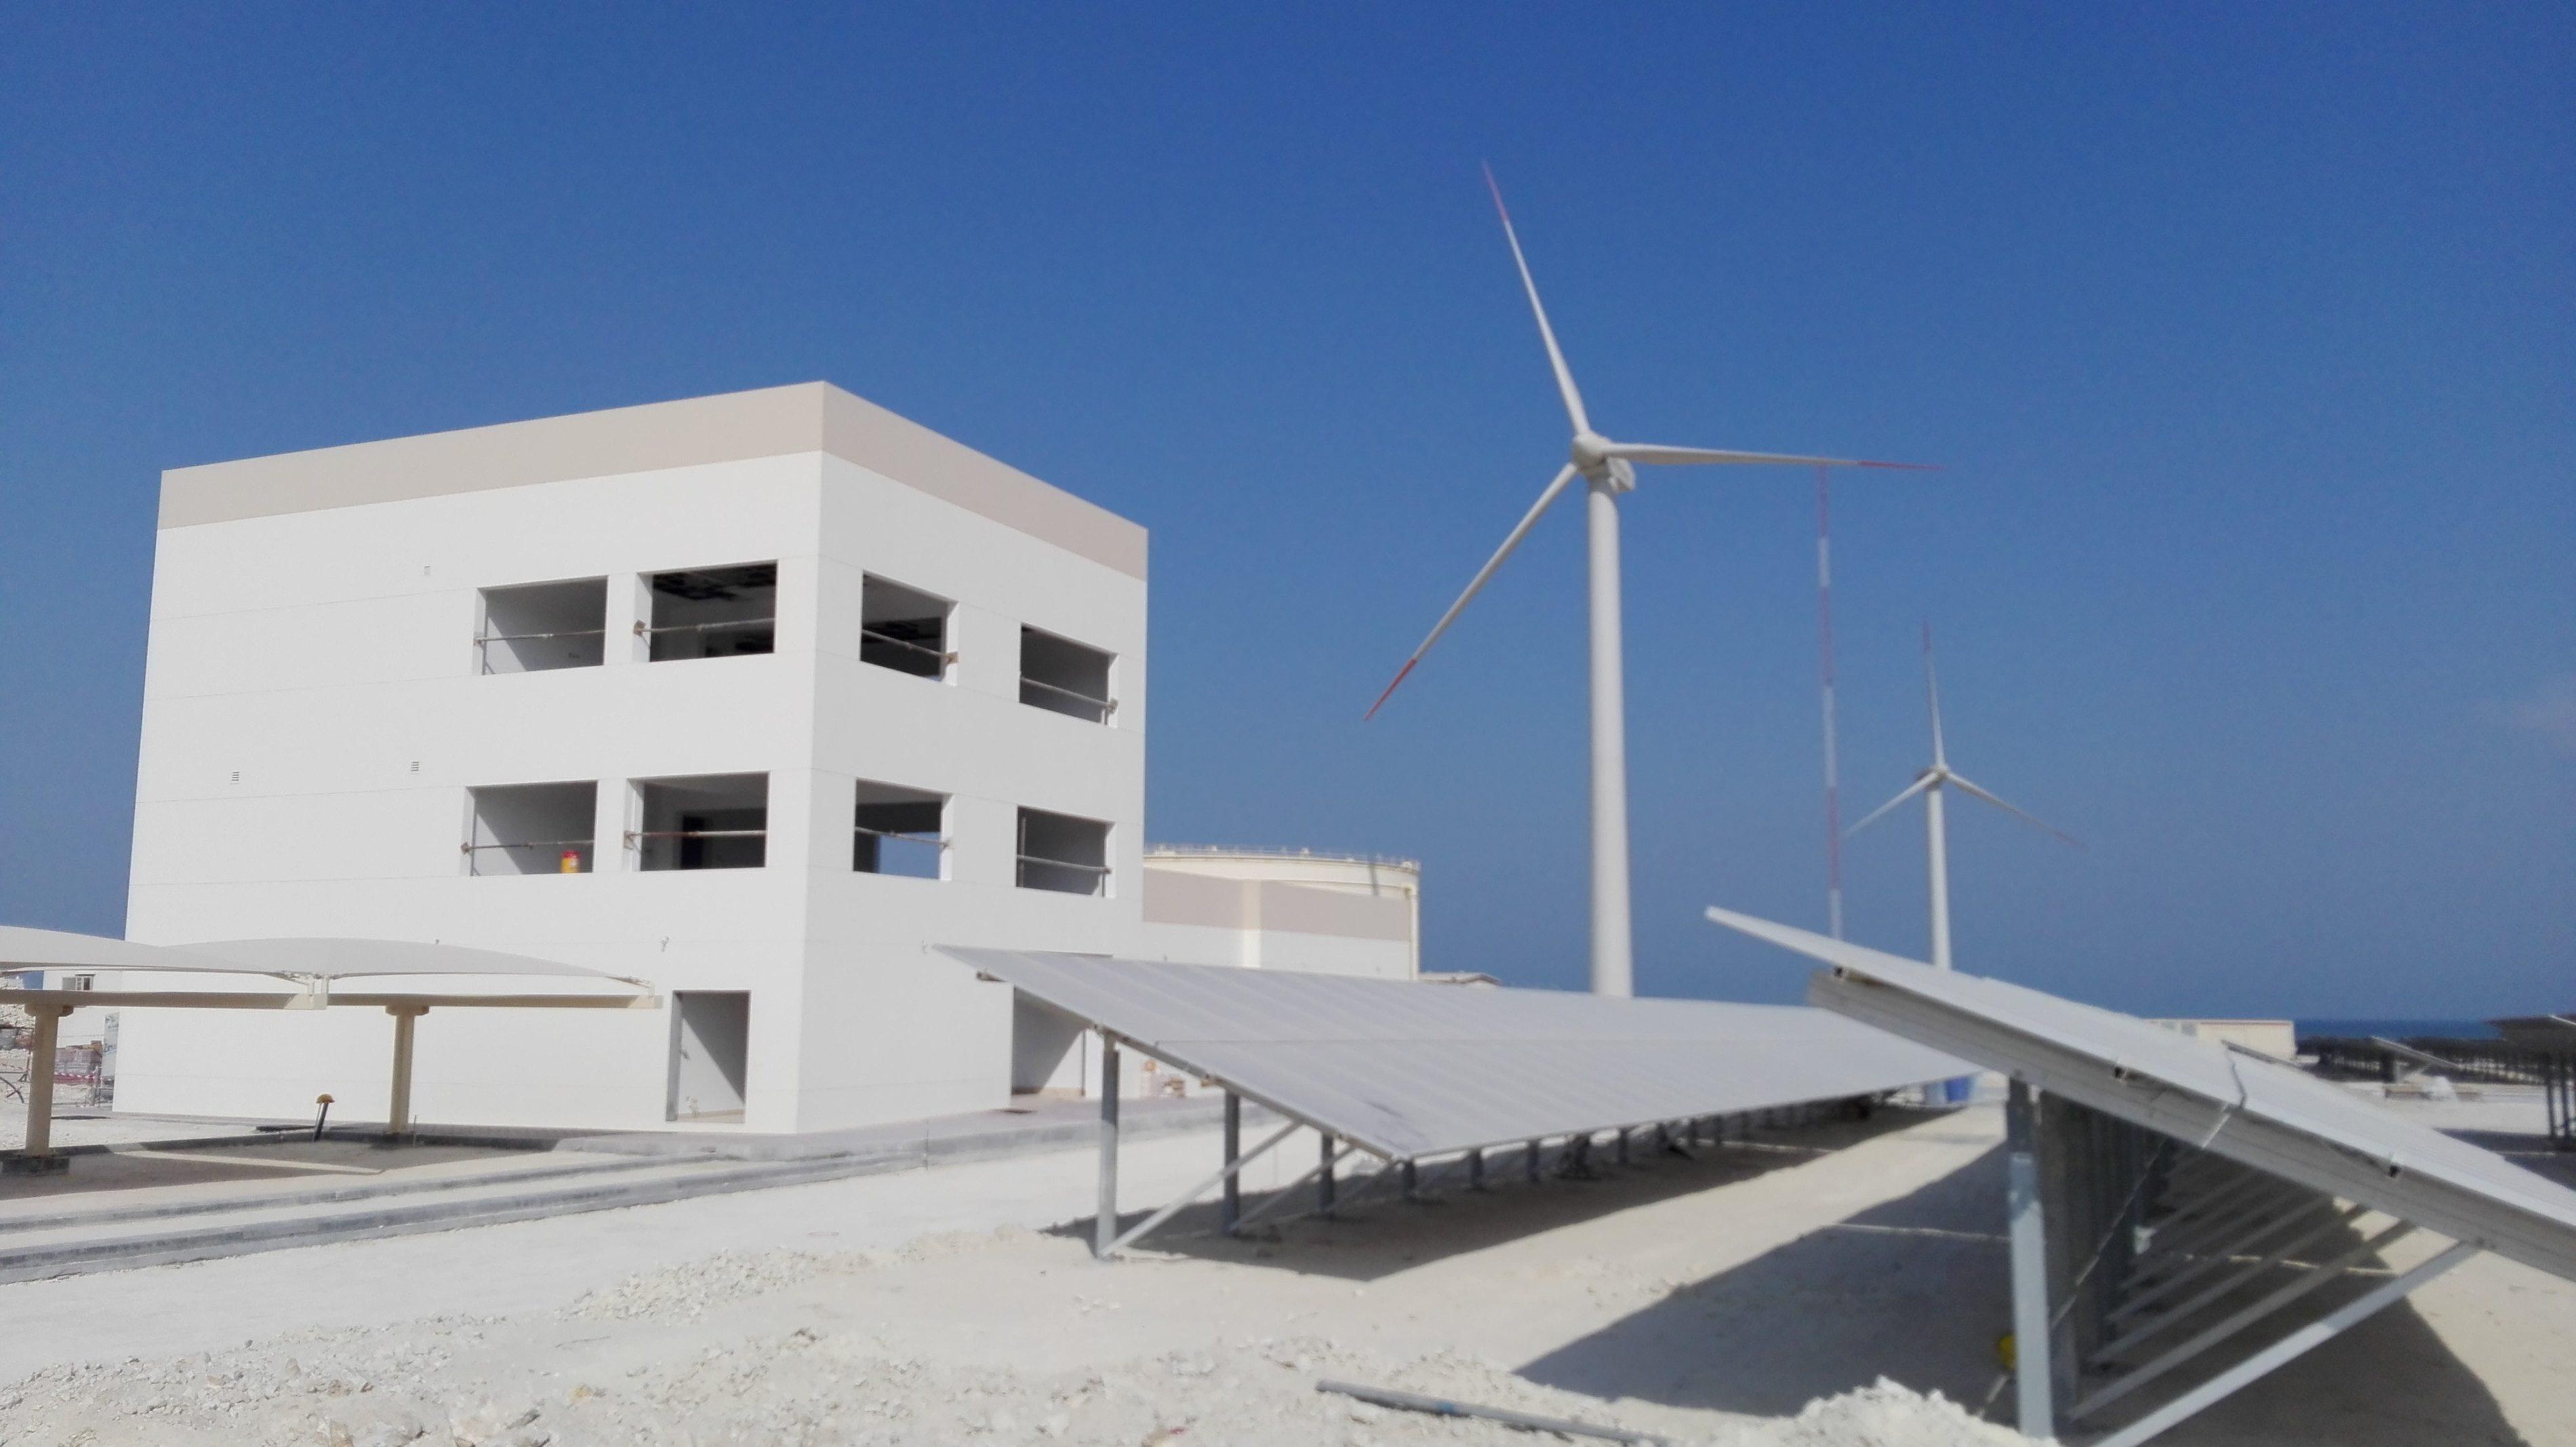 Bahrain_Solar-Windbaustelle_03